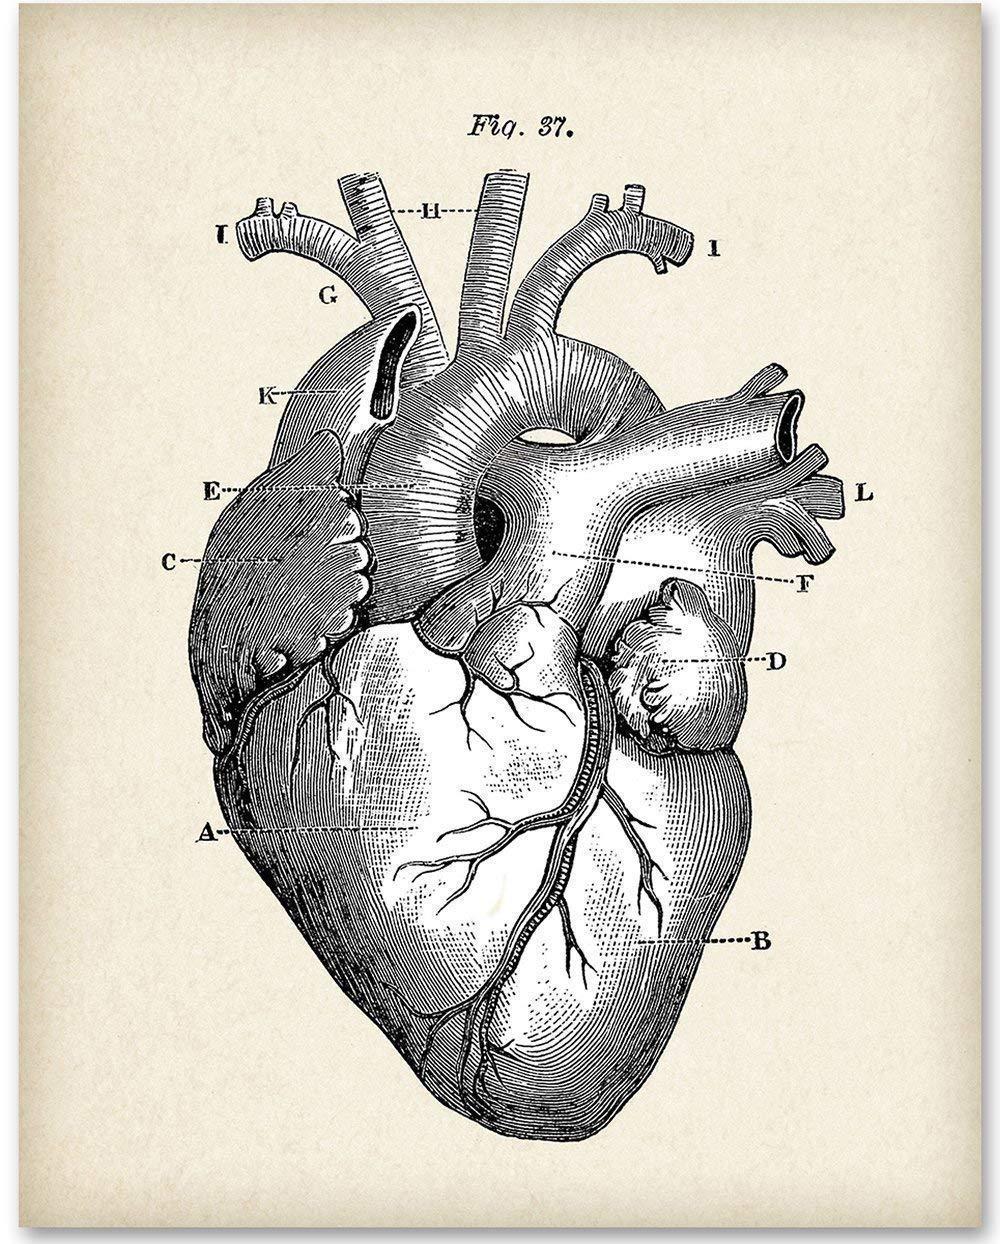 Amazon.com: Anatomical Heart - 11x14 Unframed Art Print - Makes a ...